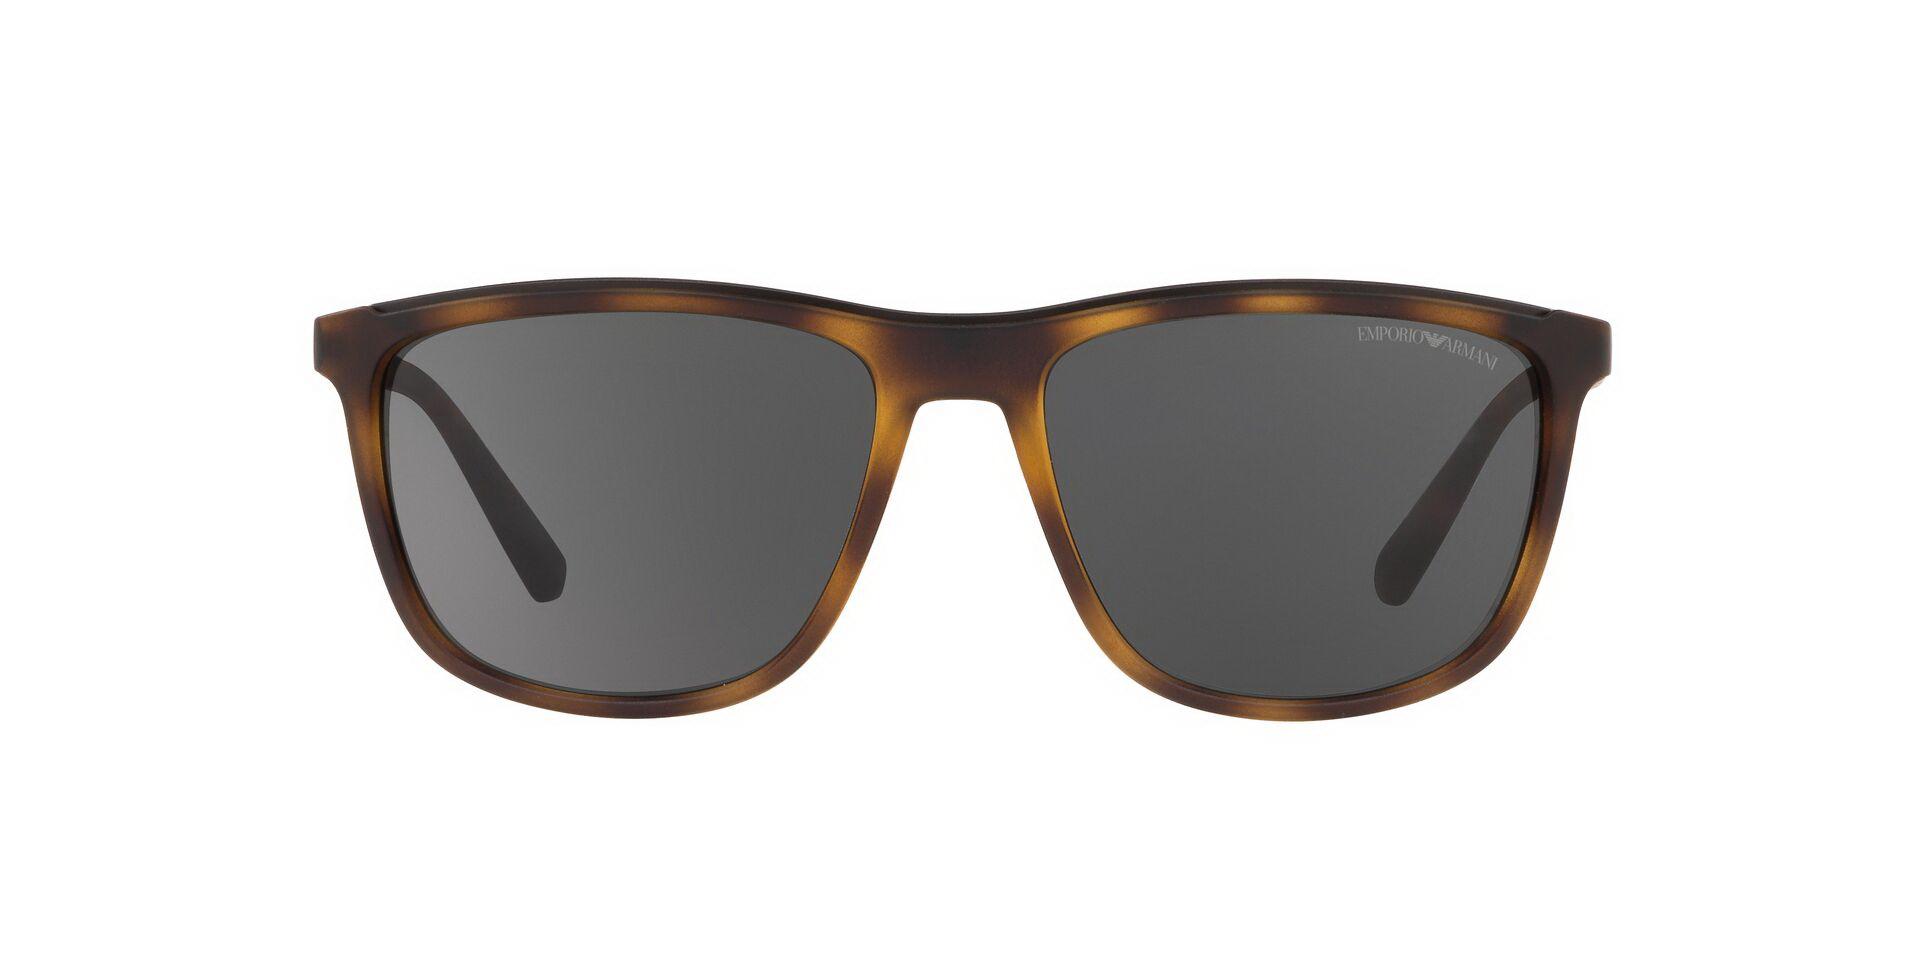 Солнцезащитные очки Очки с/з Emporio Armani 0EA4109 508987